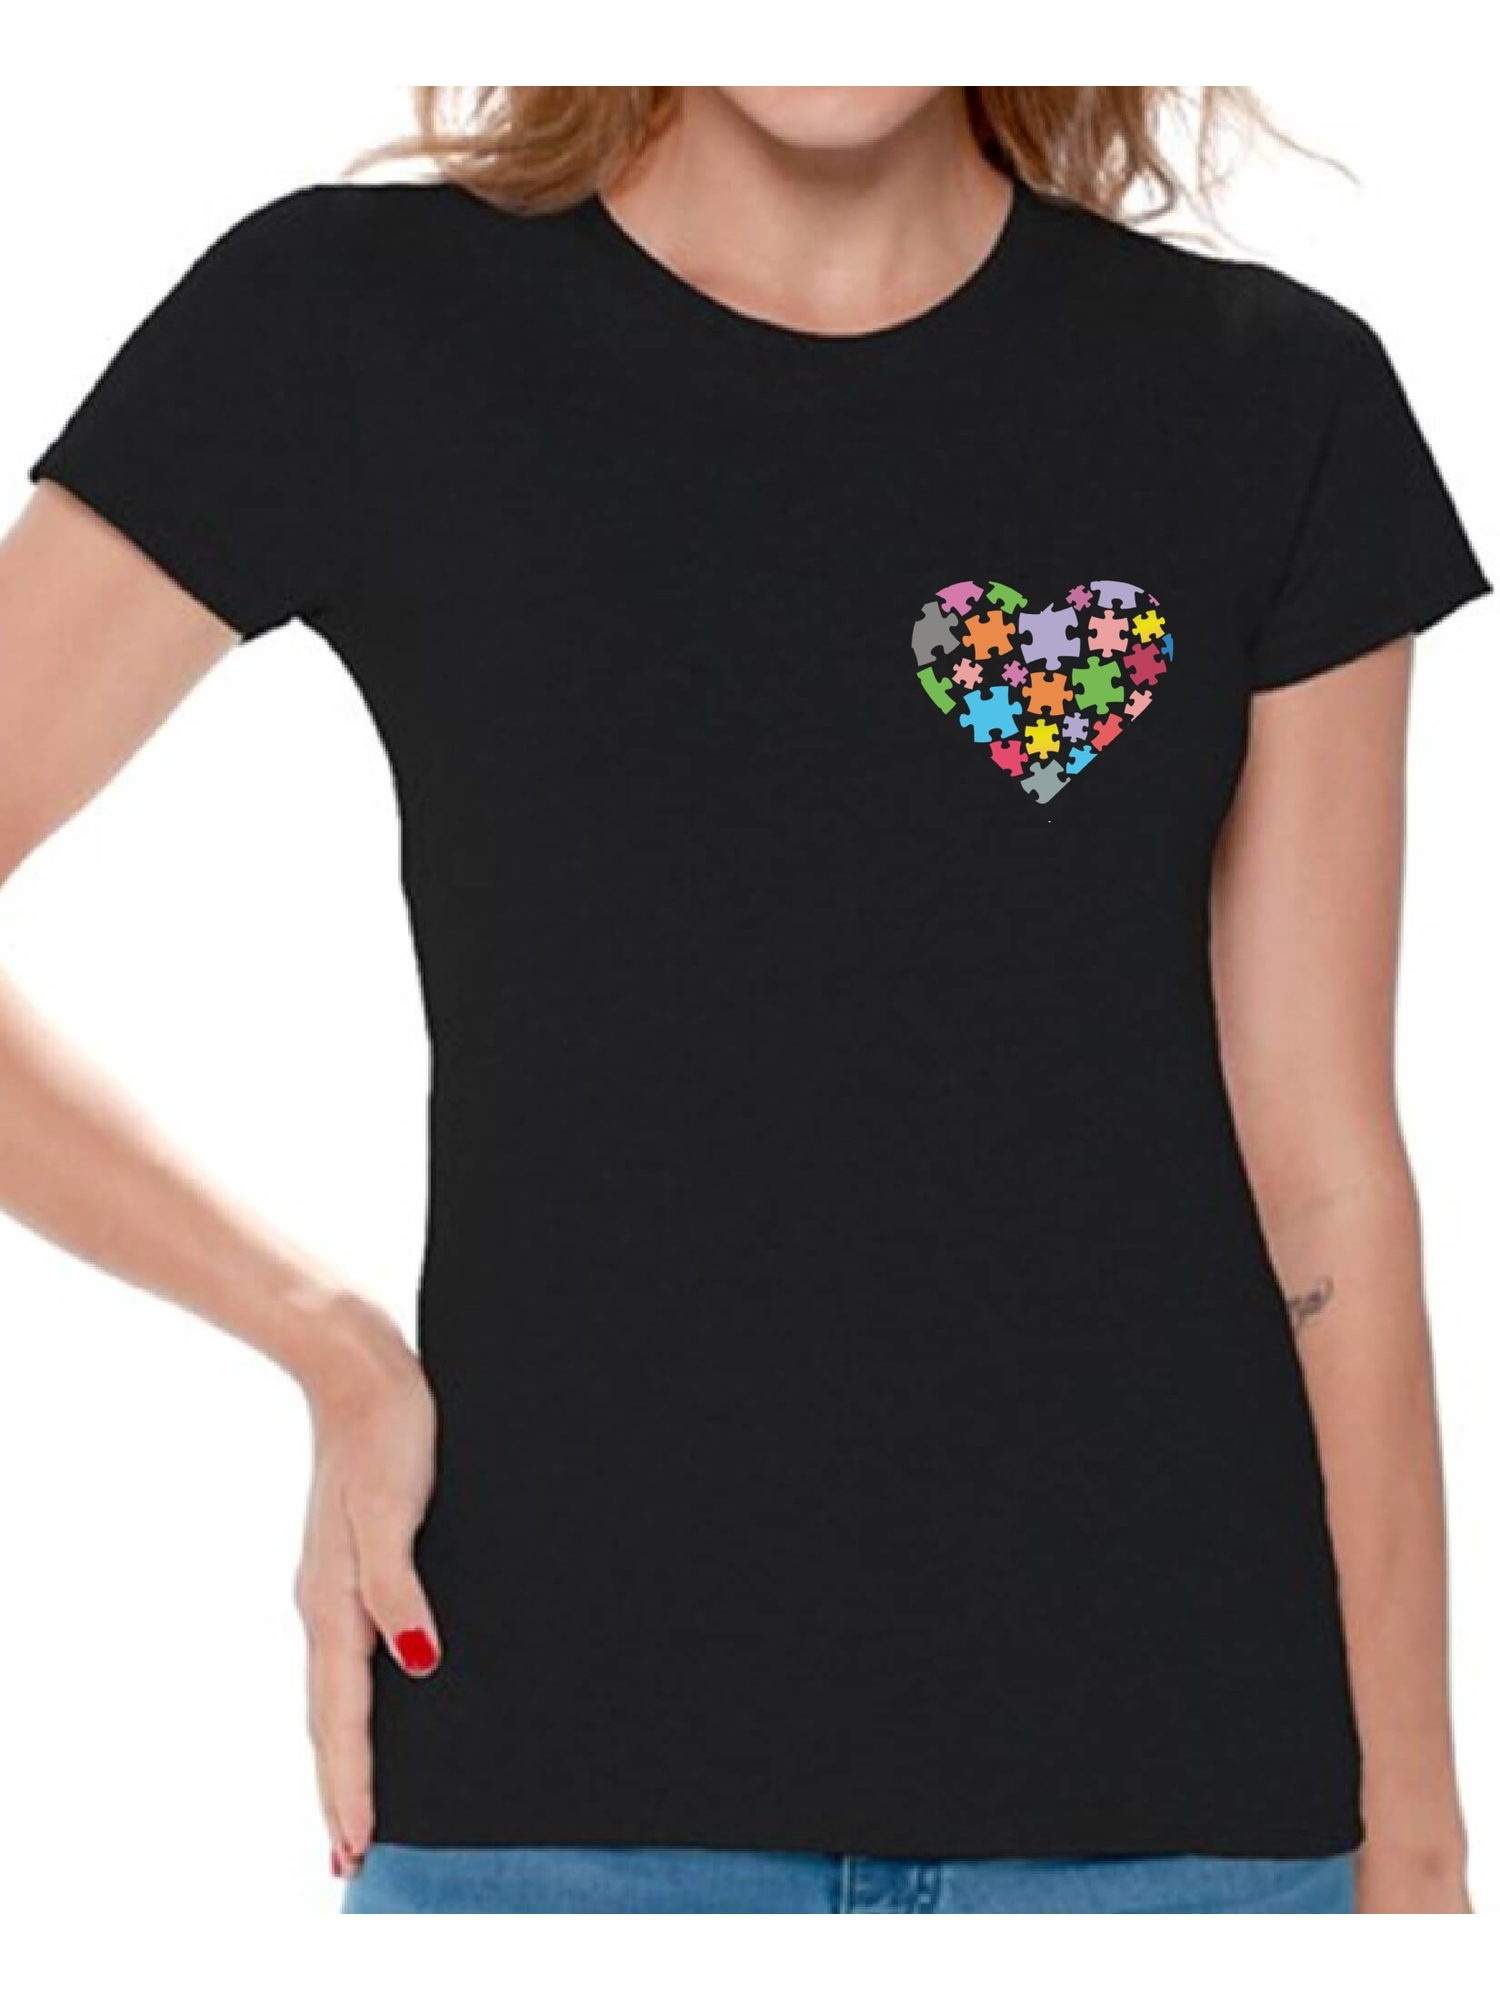 0e0e961594 Awkward Styles Autism Awareness Shirts for Women Heart Pocket T-shirt  Autism Gifts Love Puzzle Tshirt for Women Support Autism Awareness Women s  T Shirt ...